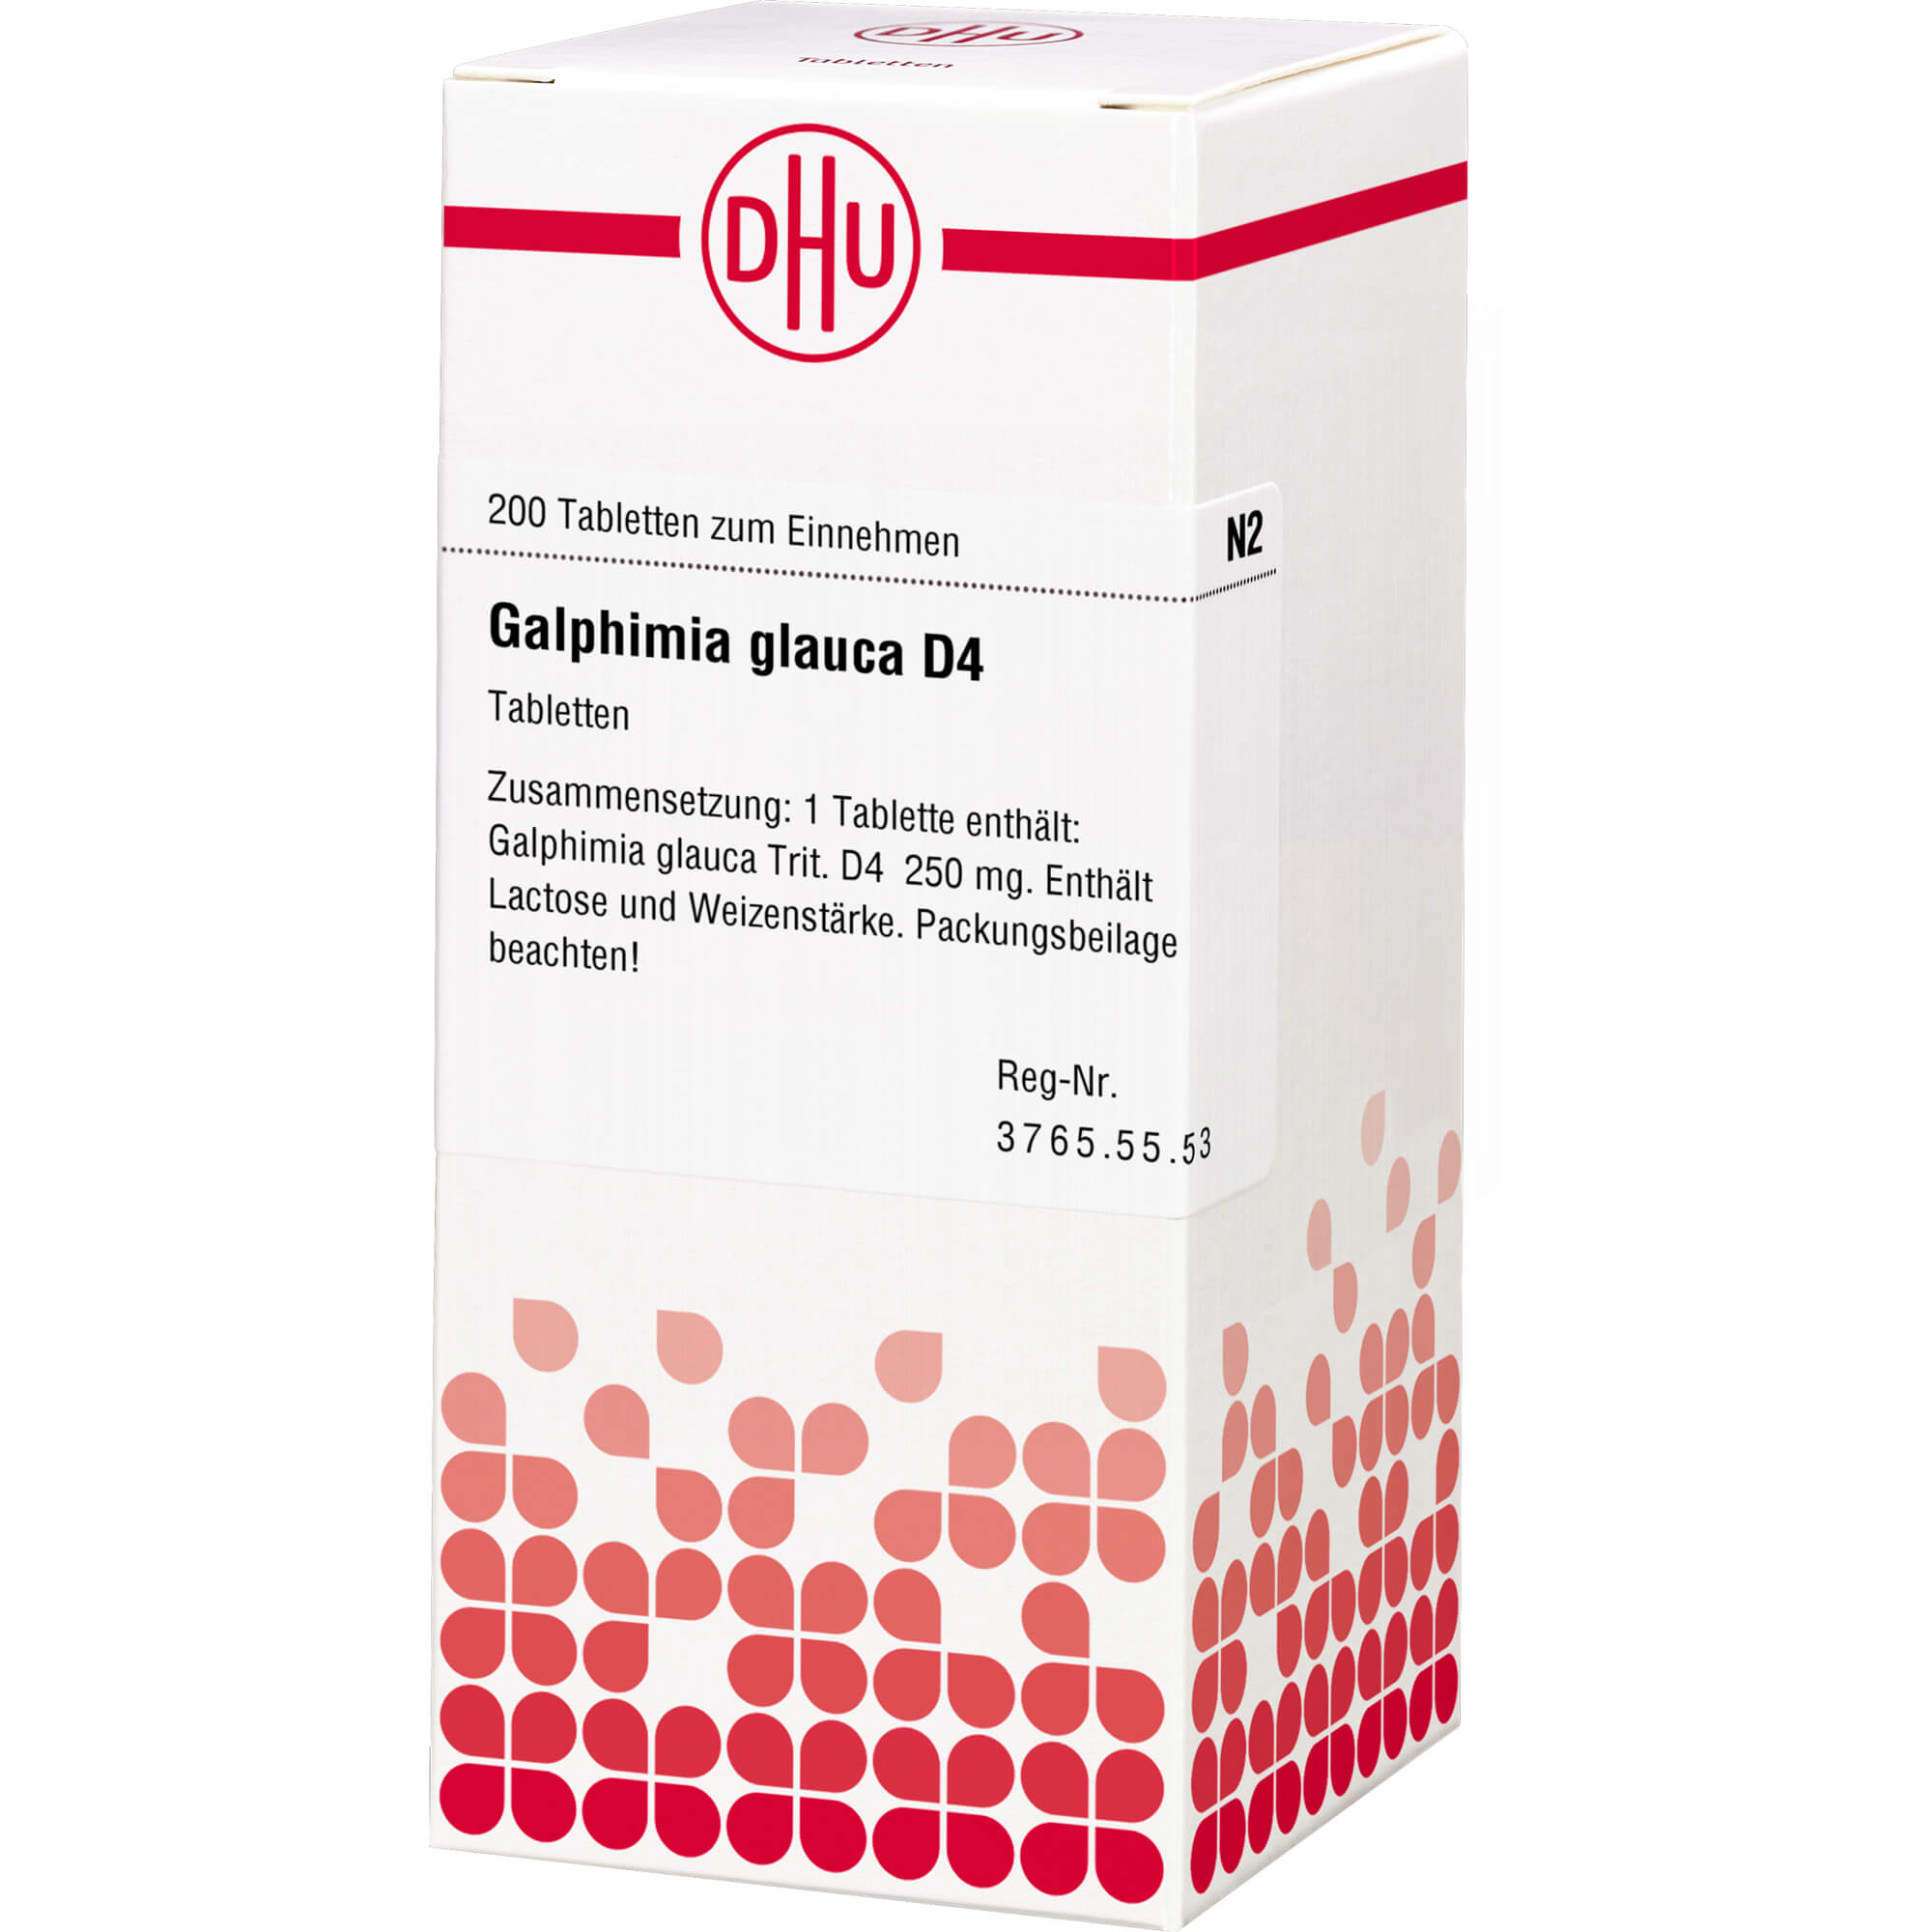 GALPHIMIA GLAUCA D 4 Tabletten